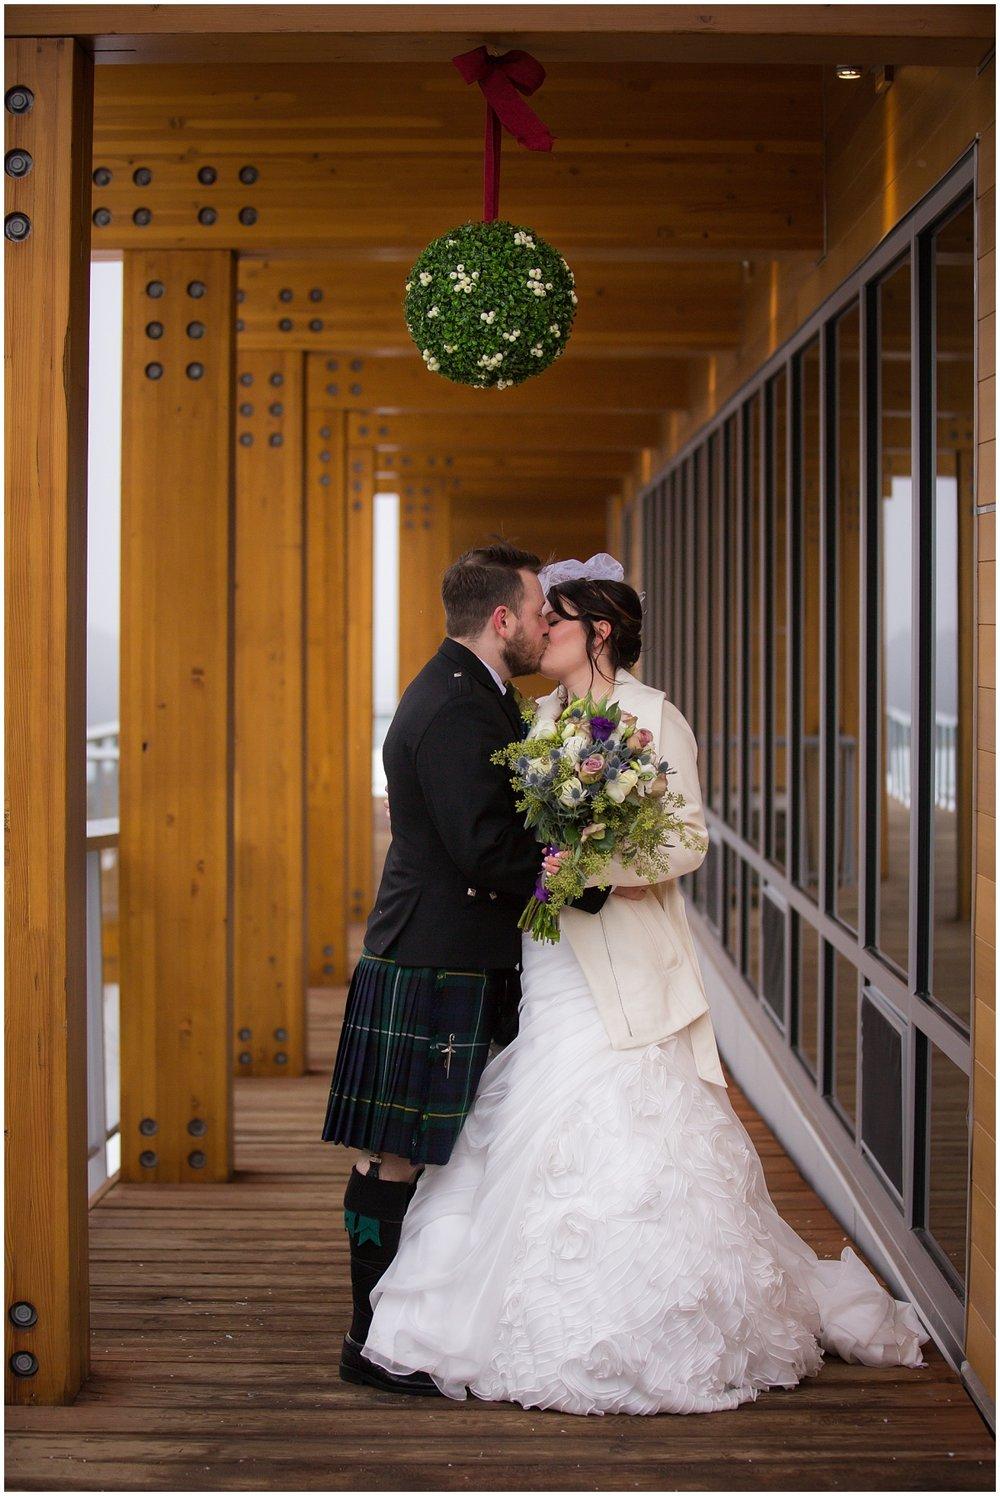 Amazing Day Photography - Squamish Wedding - Howe Sound Inn Wedding - Sea to Sky Gondola Wedding - Squamish Wedding Photographer - Winter Wedding - Snowy Wedding (14).jpg